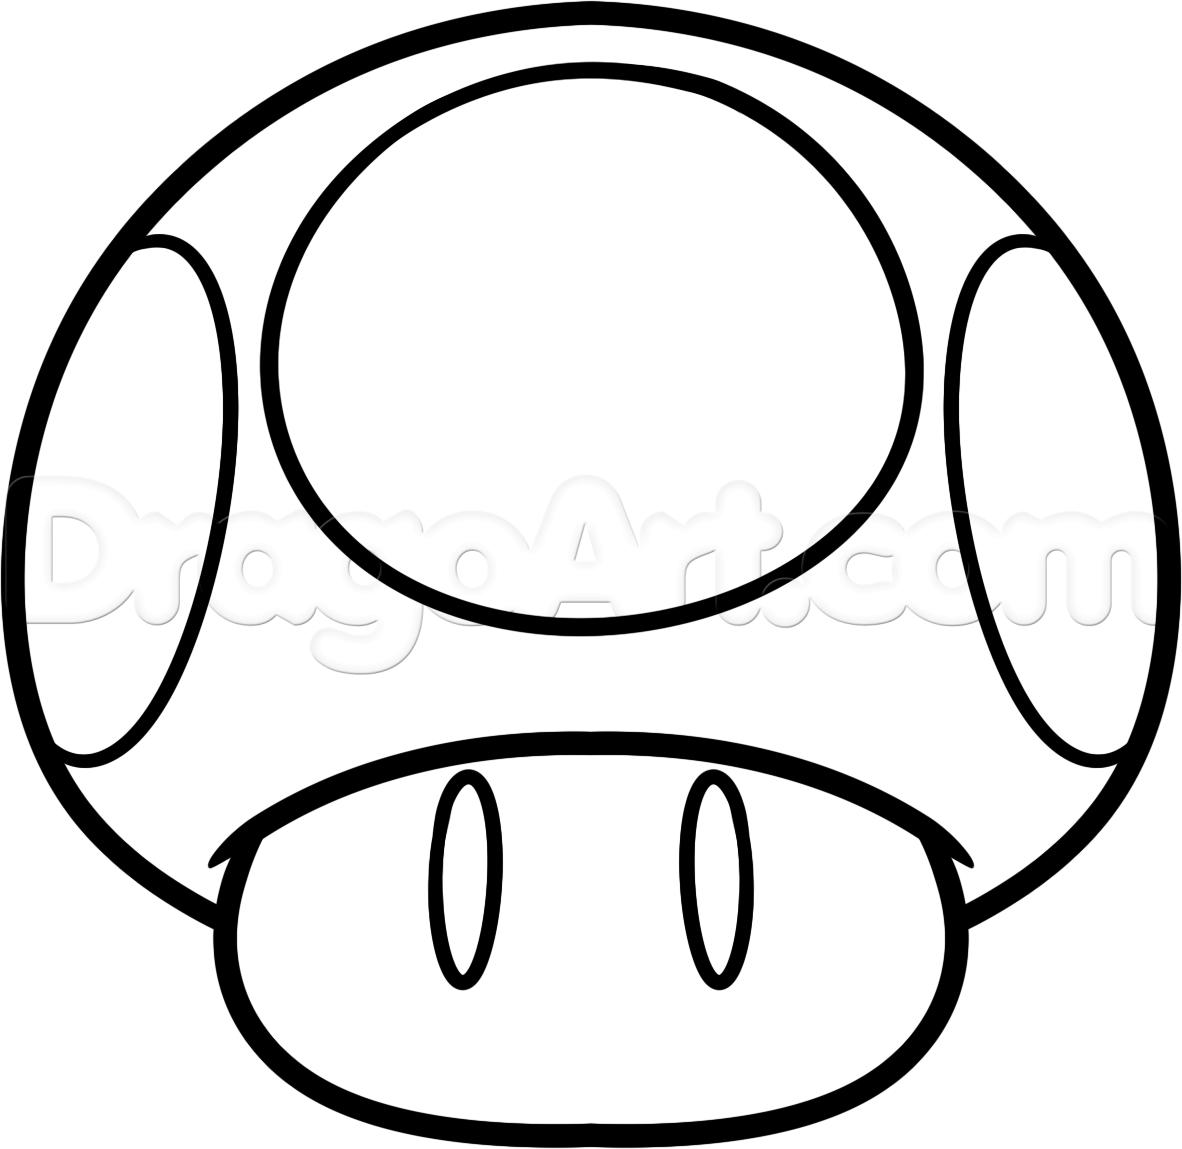 mario mushroom   Super Mario Halloween   Pinterest   Cricut, Rock painting and Craft